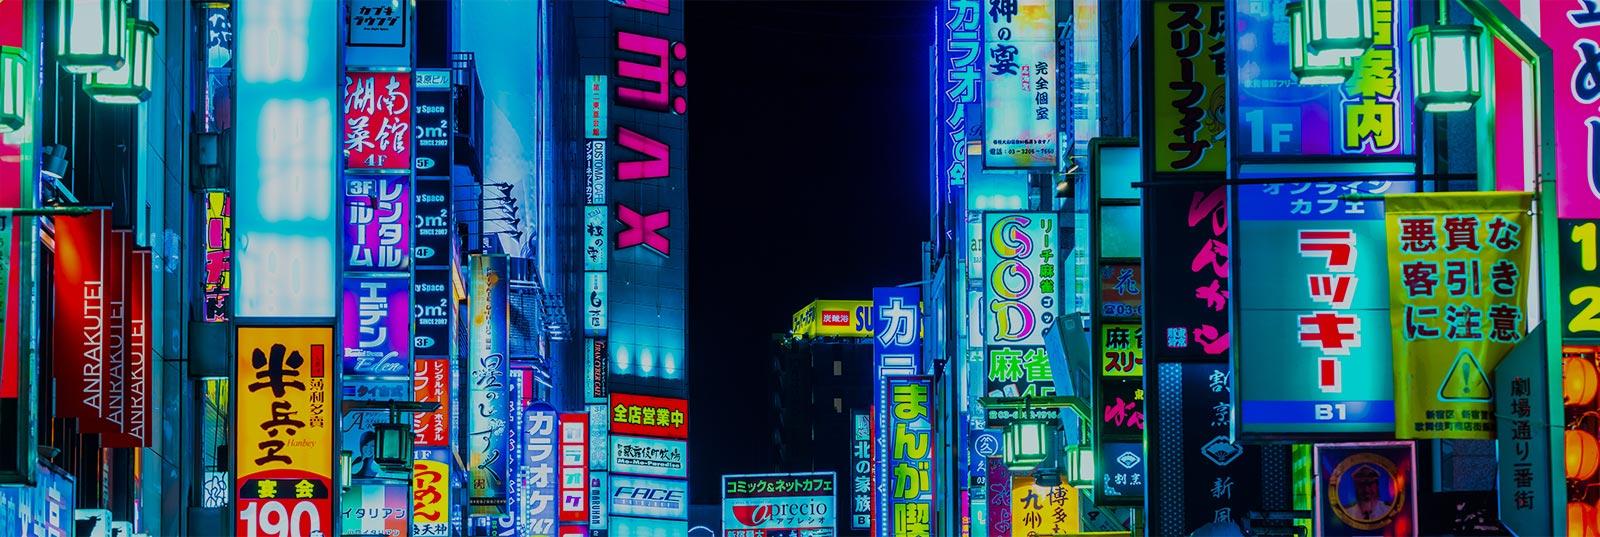 Guía turística de Tokyo